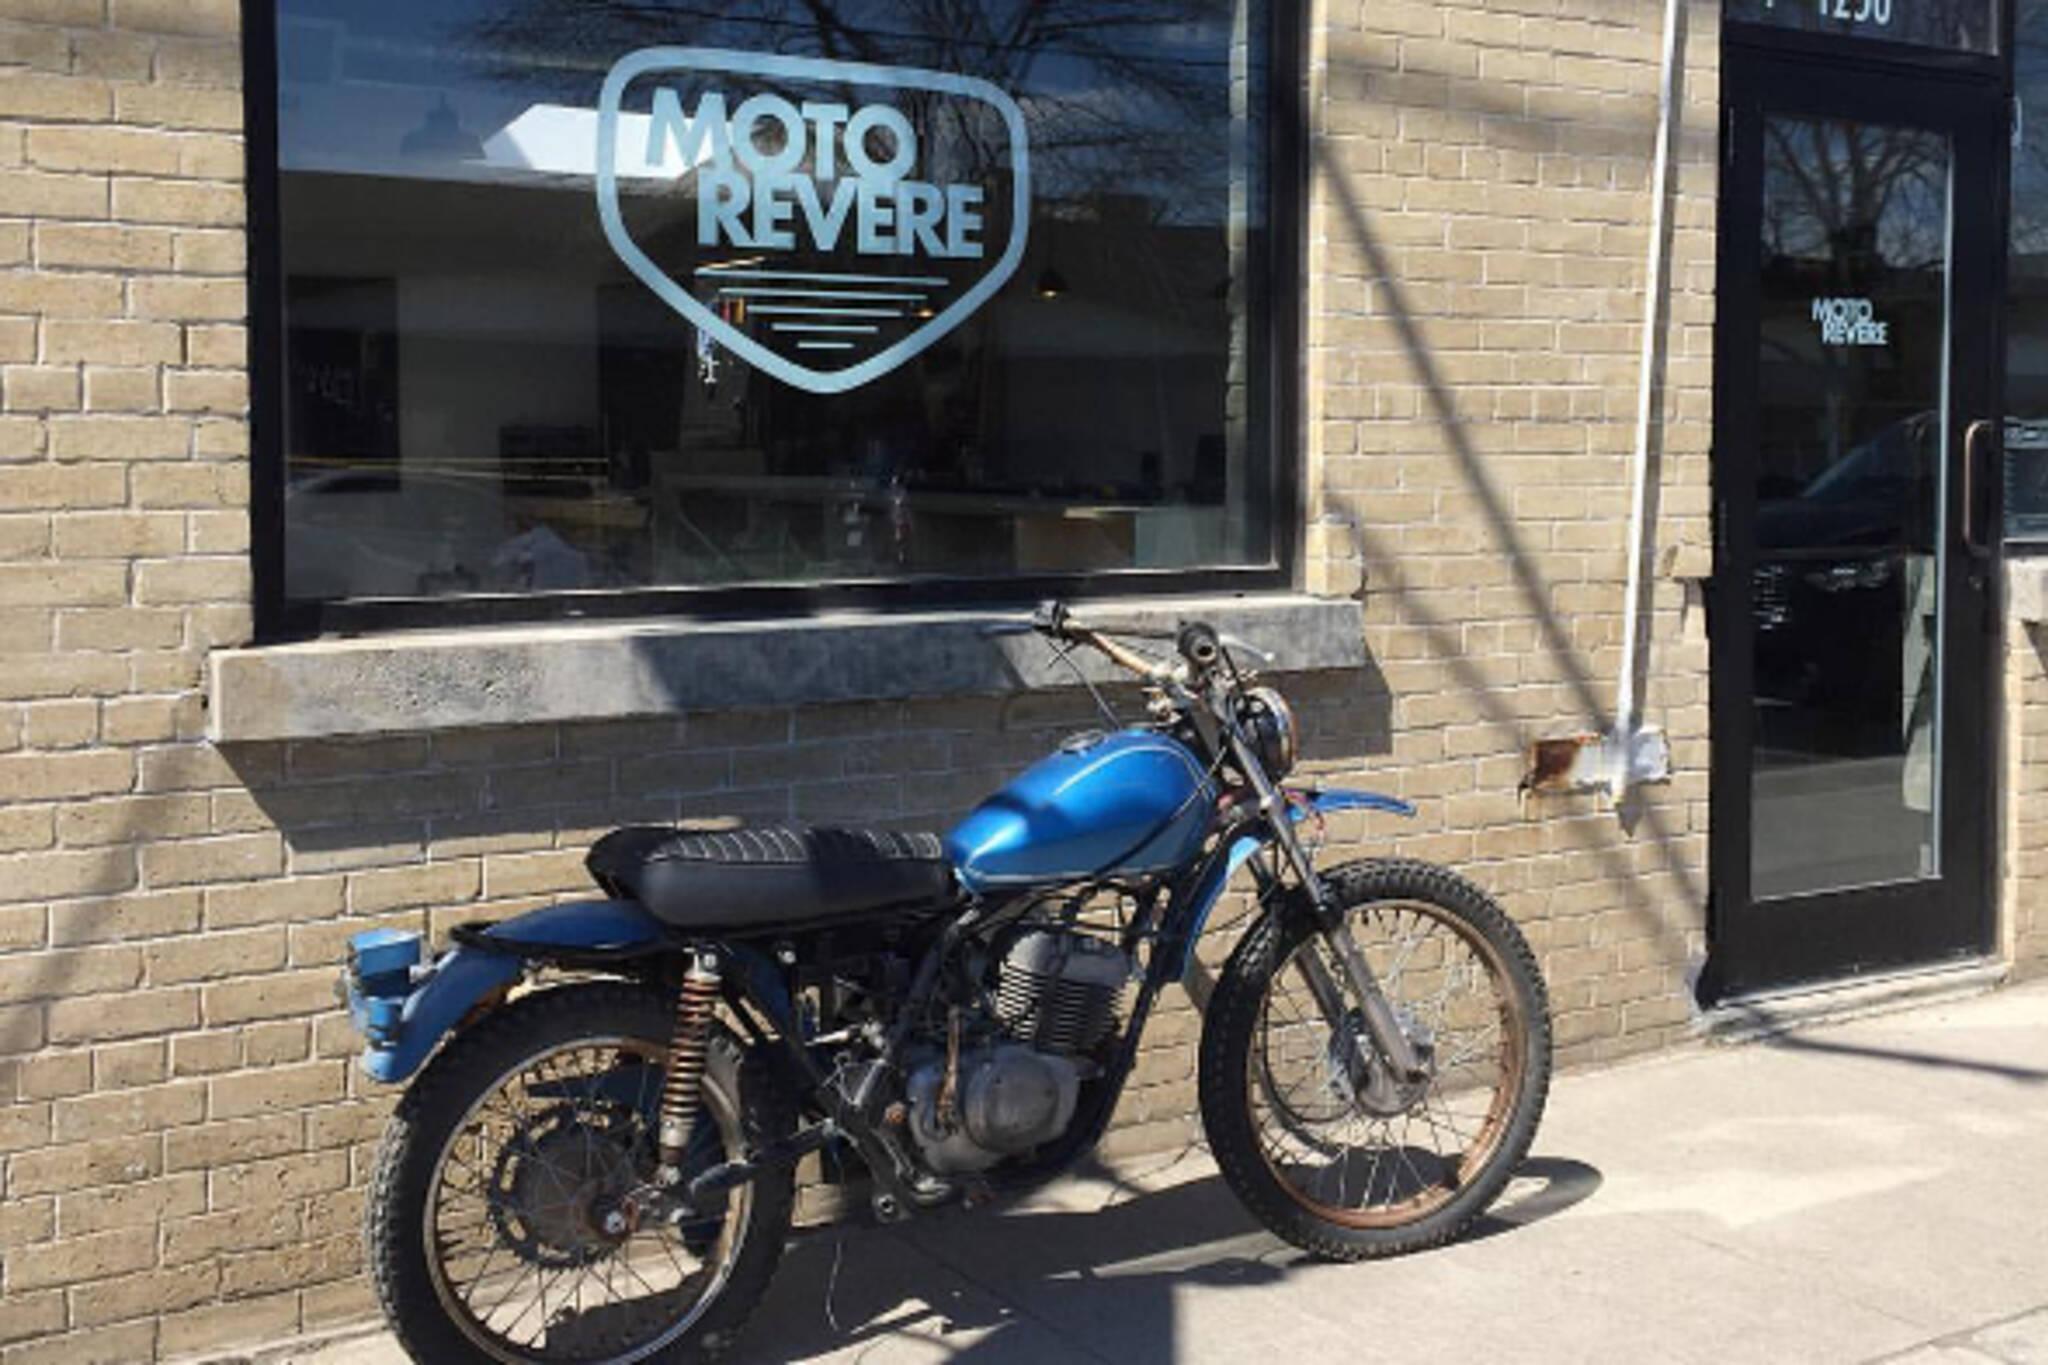 Moto Revere Toronto